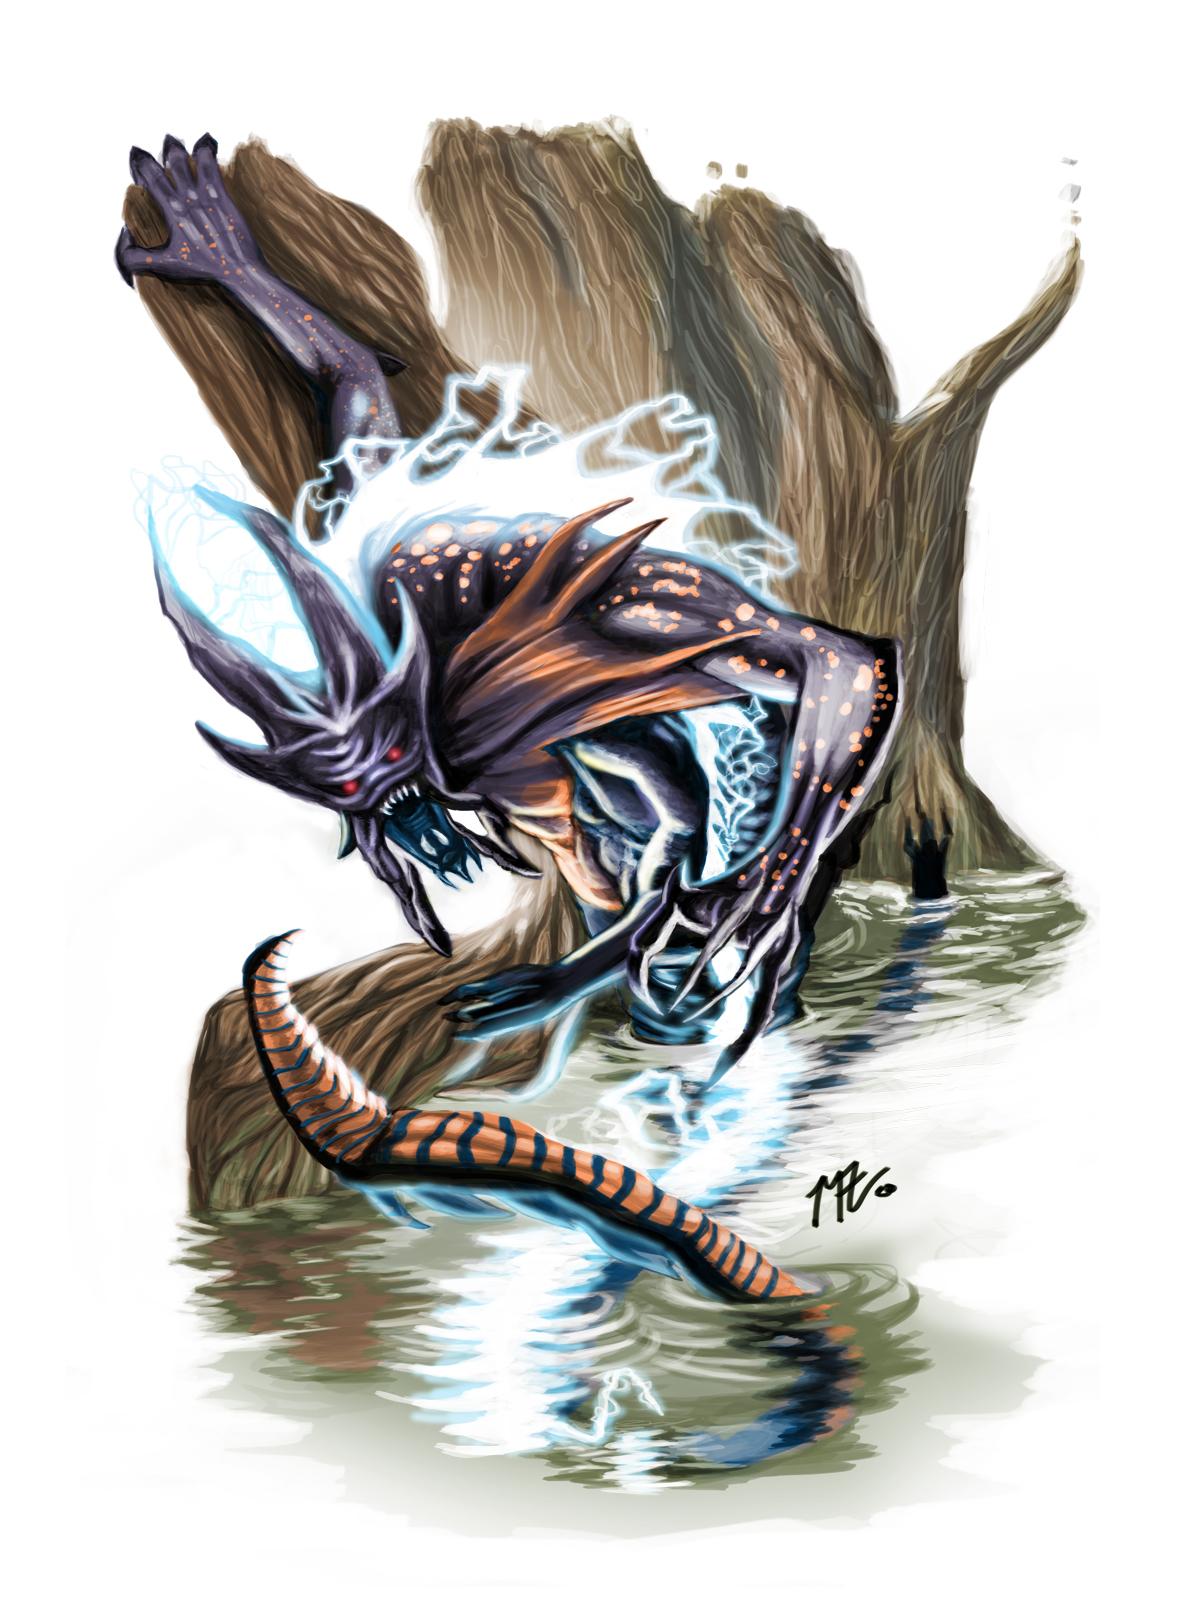 Vignette digital painting of a Salamander Demon